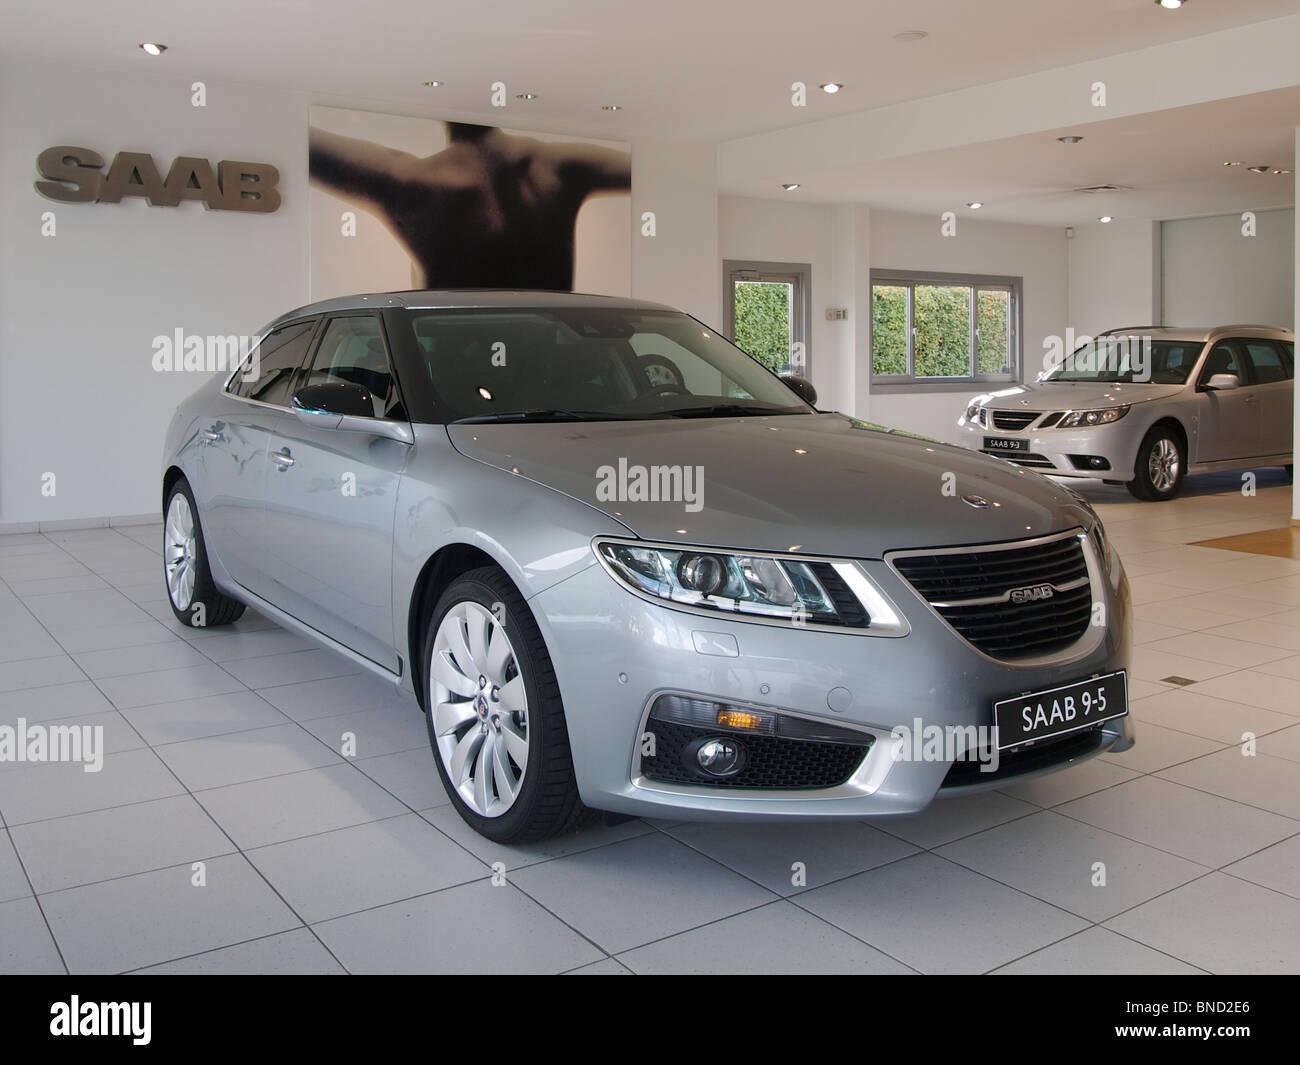 The new 2010 Saab 9-5 model in dealer showroom in Oud Turnhout, Belgium - Stock Image